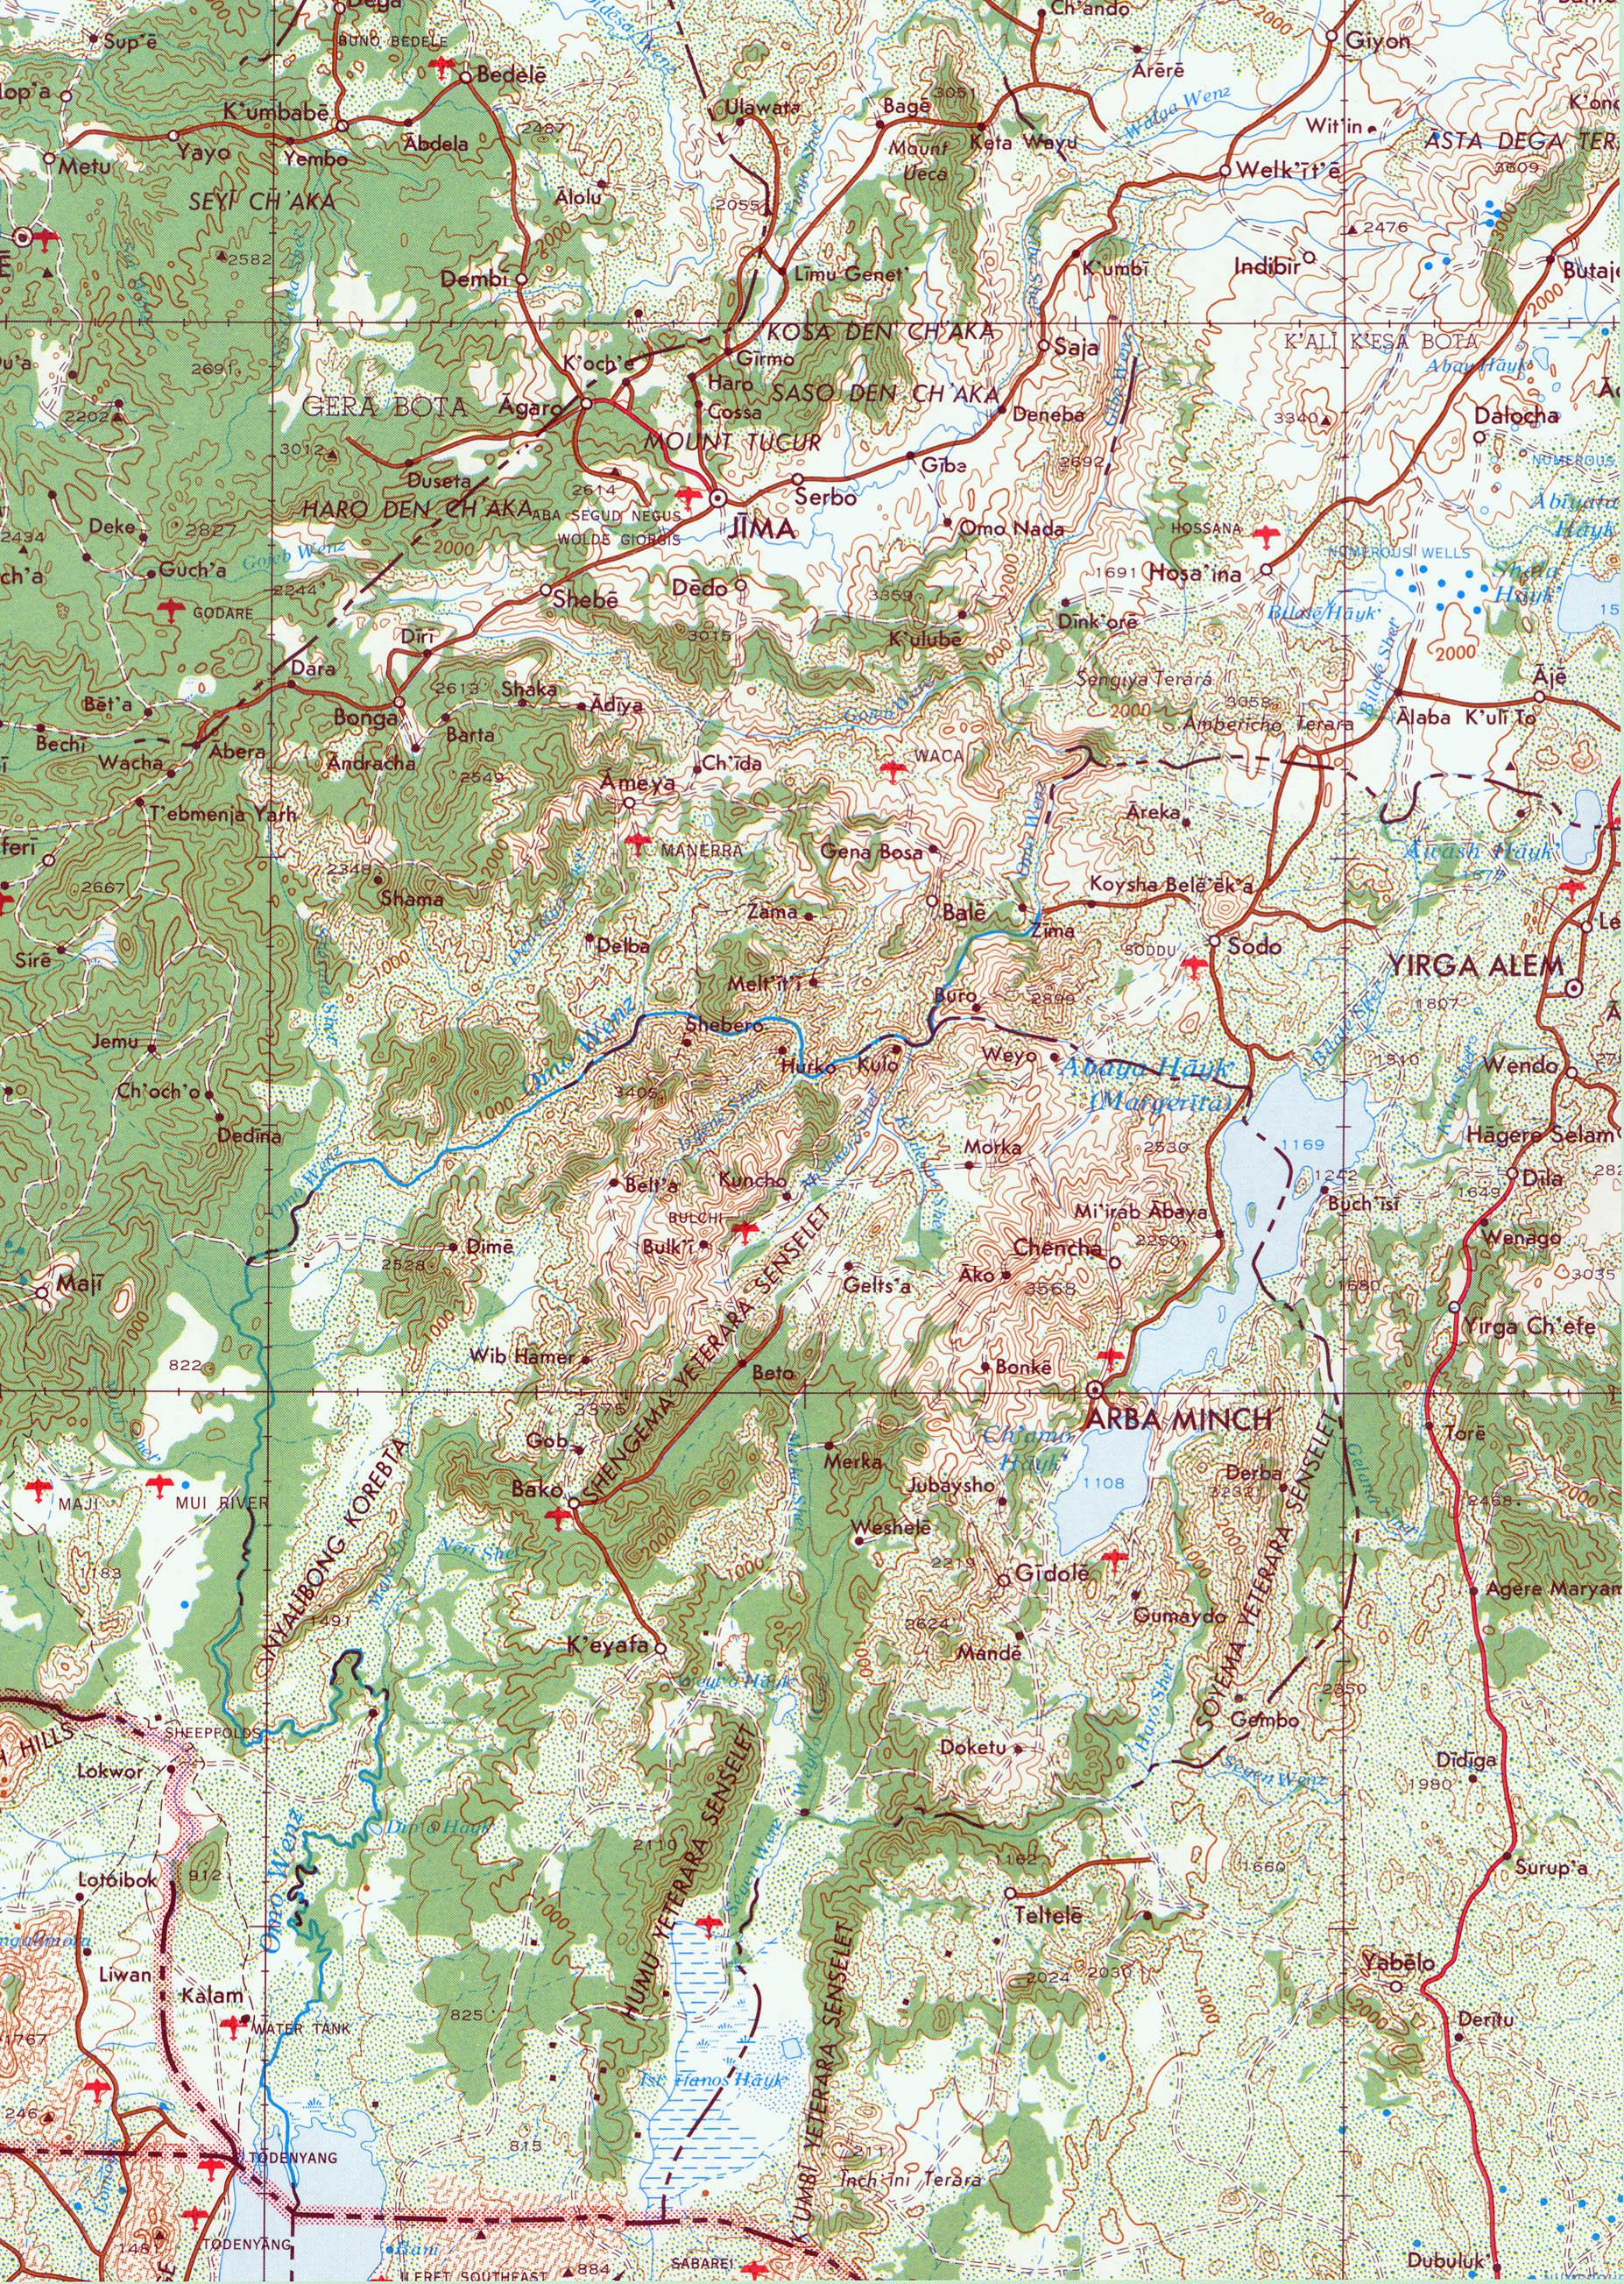 Free Ethiopia Maps on food of ethiopia, satellite map kenya, elevation of ethiopia, village of ethiopia, flora of ethiopia, geographic features of ethiopia, coordinates of ethiopia, king of ethiopia, road map ethiopia, native animal in ethiopia, aerial view of ethiopia, sodo ethiopia, national flag of ethiopia, capital of ethiopia, nazret ethiopia, gojjam ethiopia, city of ethiopia, afar region ethiopia, awash ethiopia,